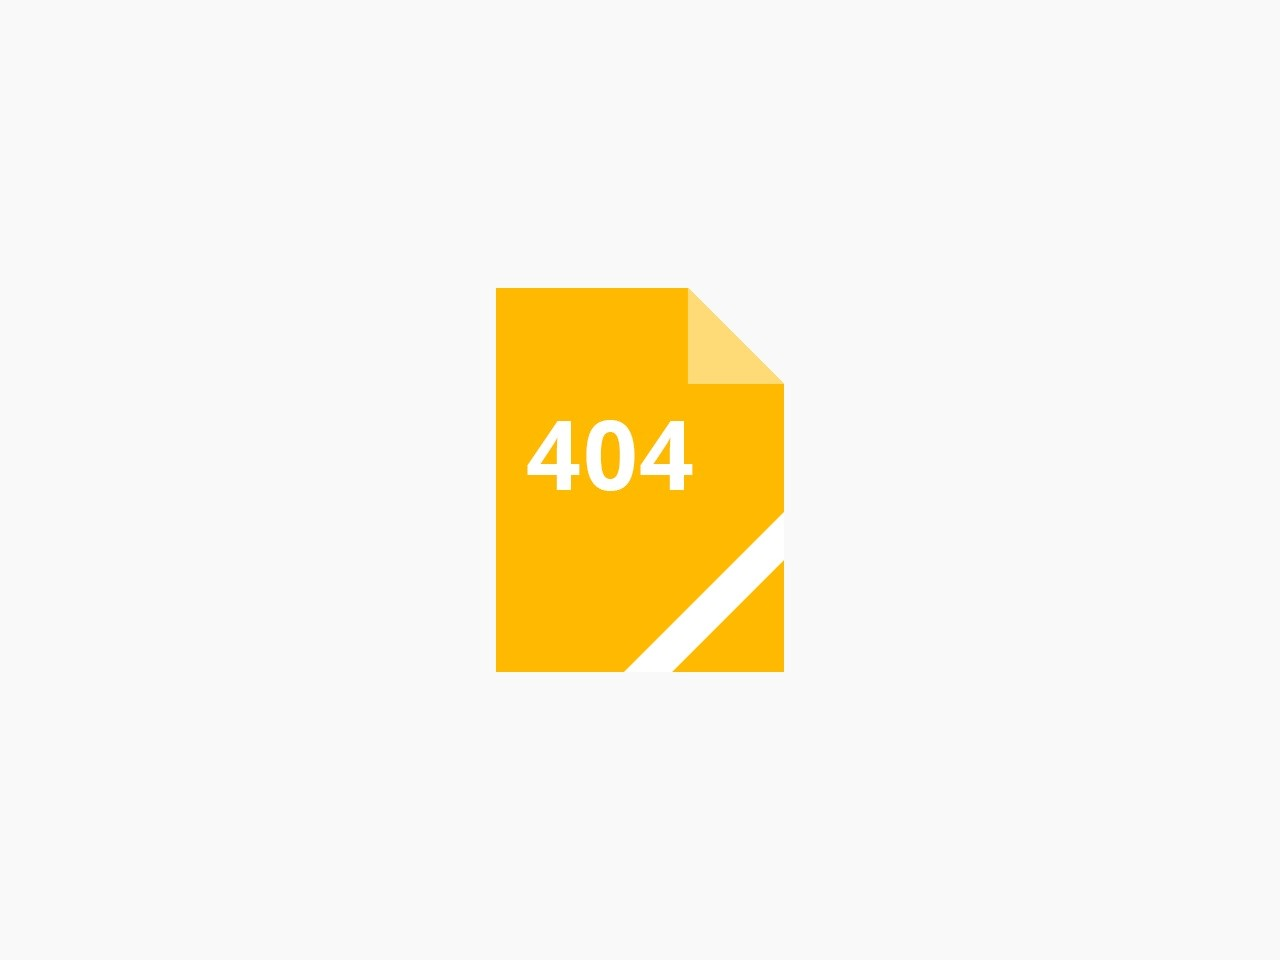 Ireland ahoy! as luxury super-yachts roll in